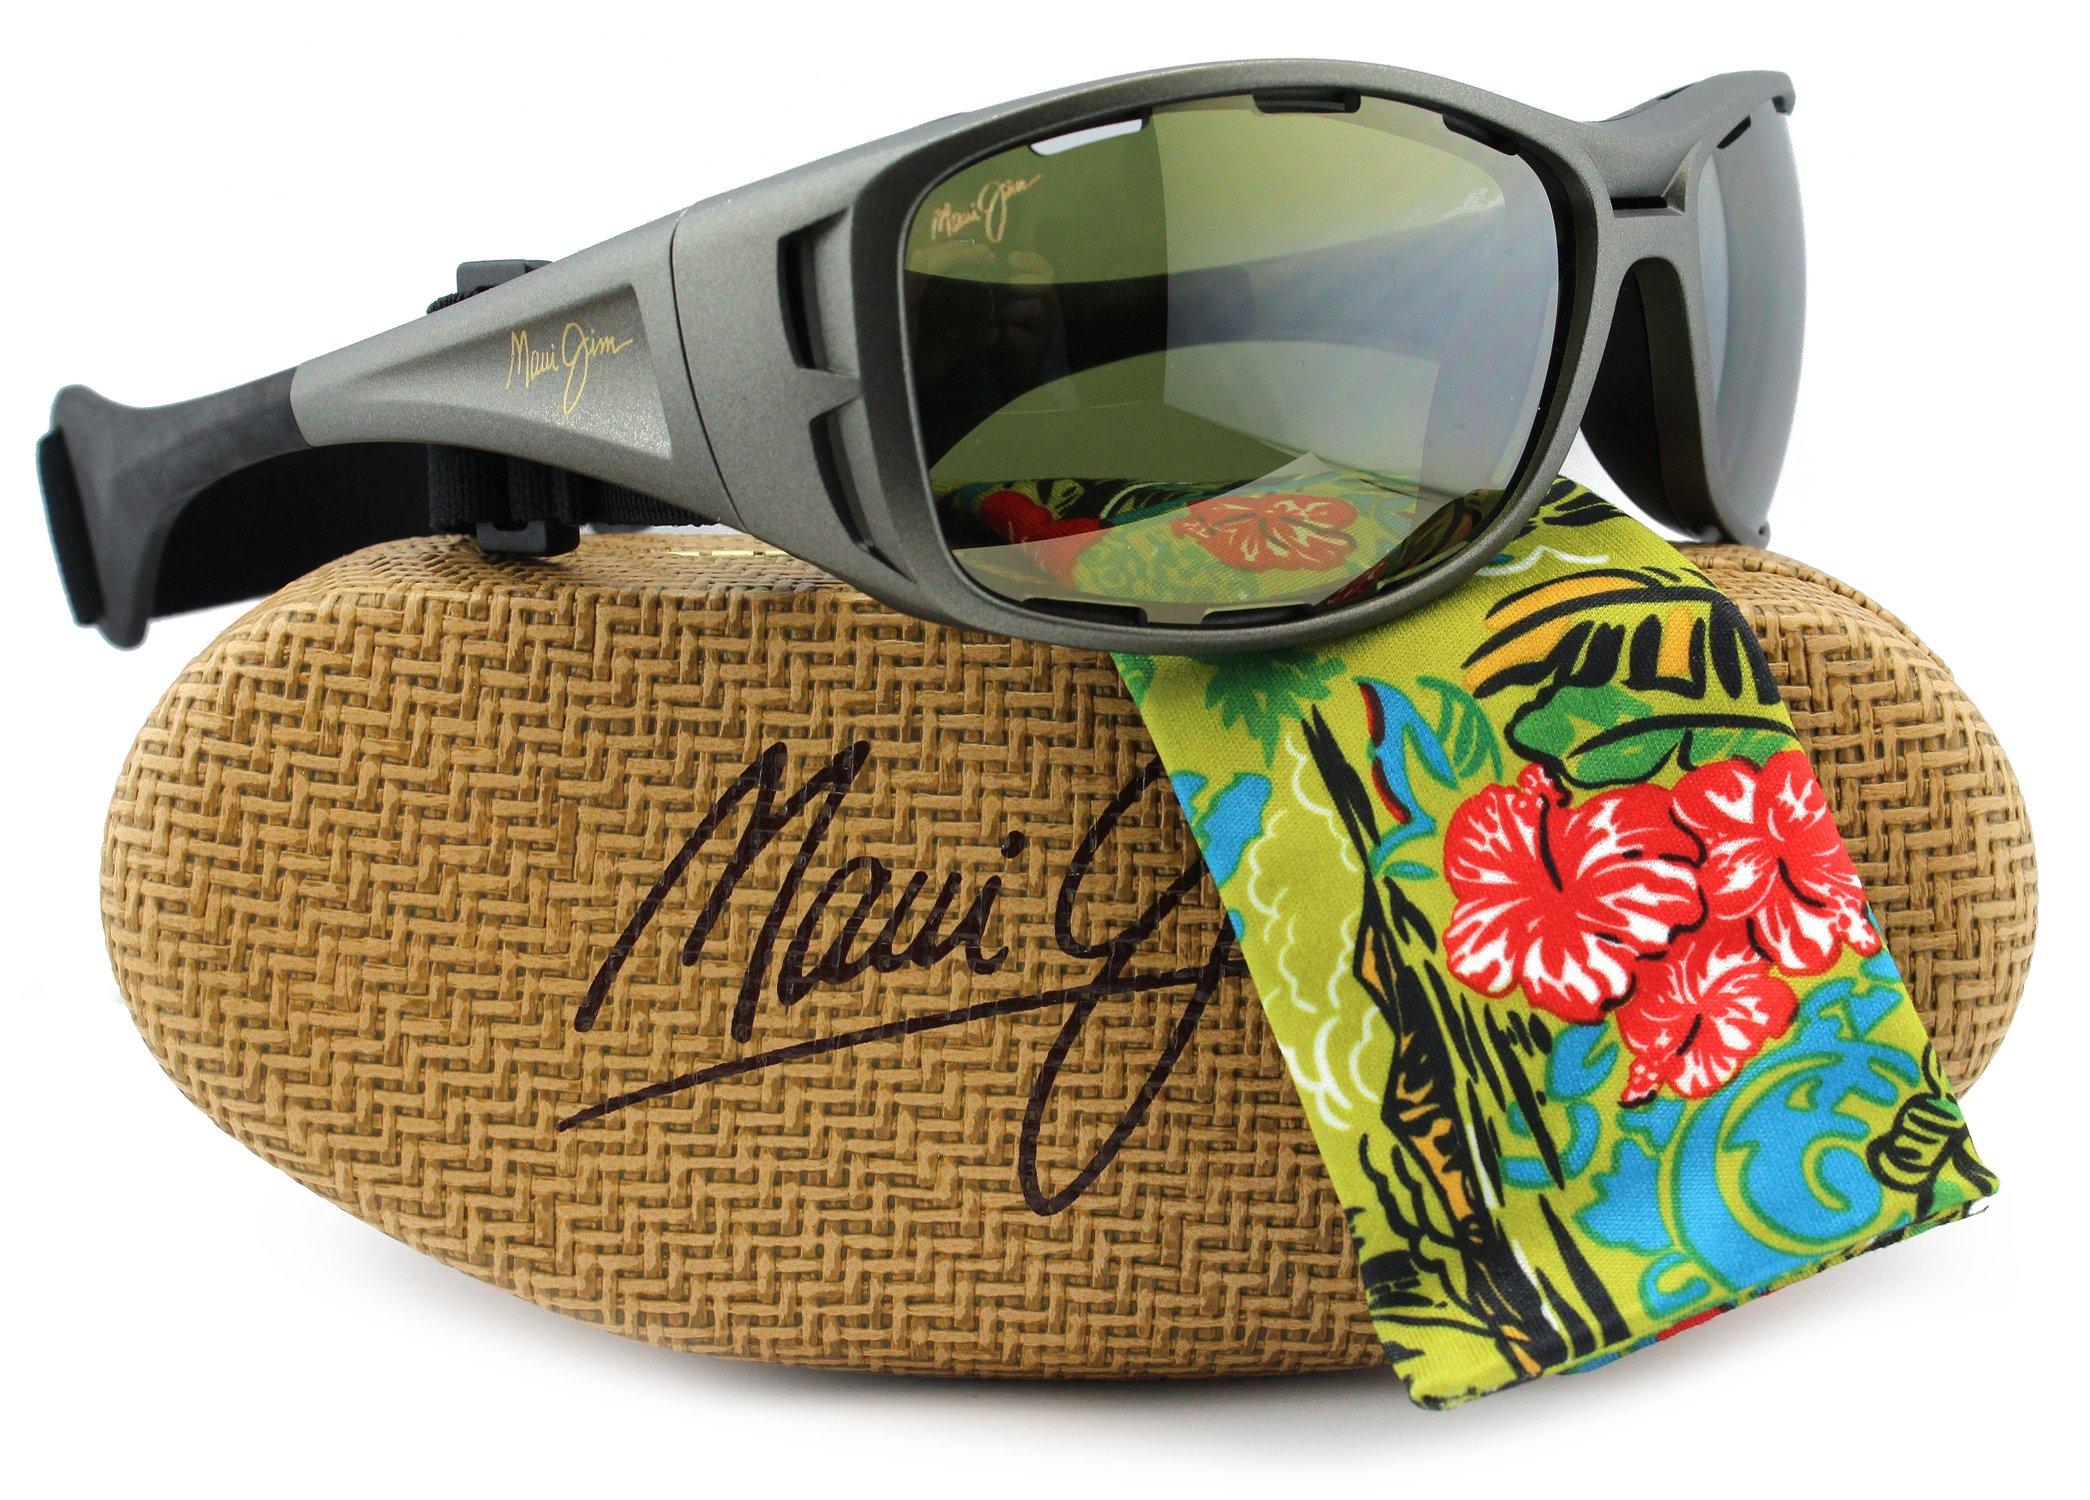 Maui Jim HT410-11B Waterman Sunglasses Titanium w/ Maui HT HT410 11B 63.5mm Authentic